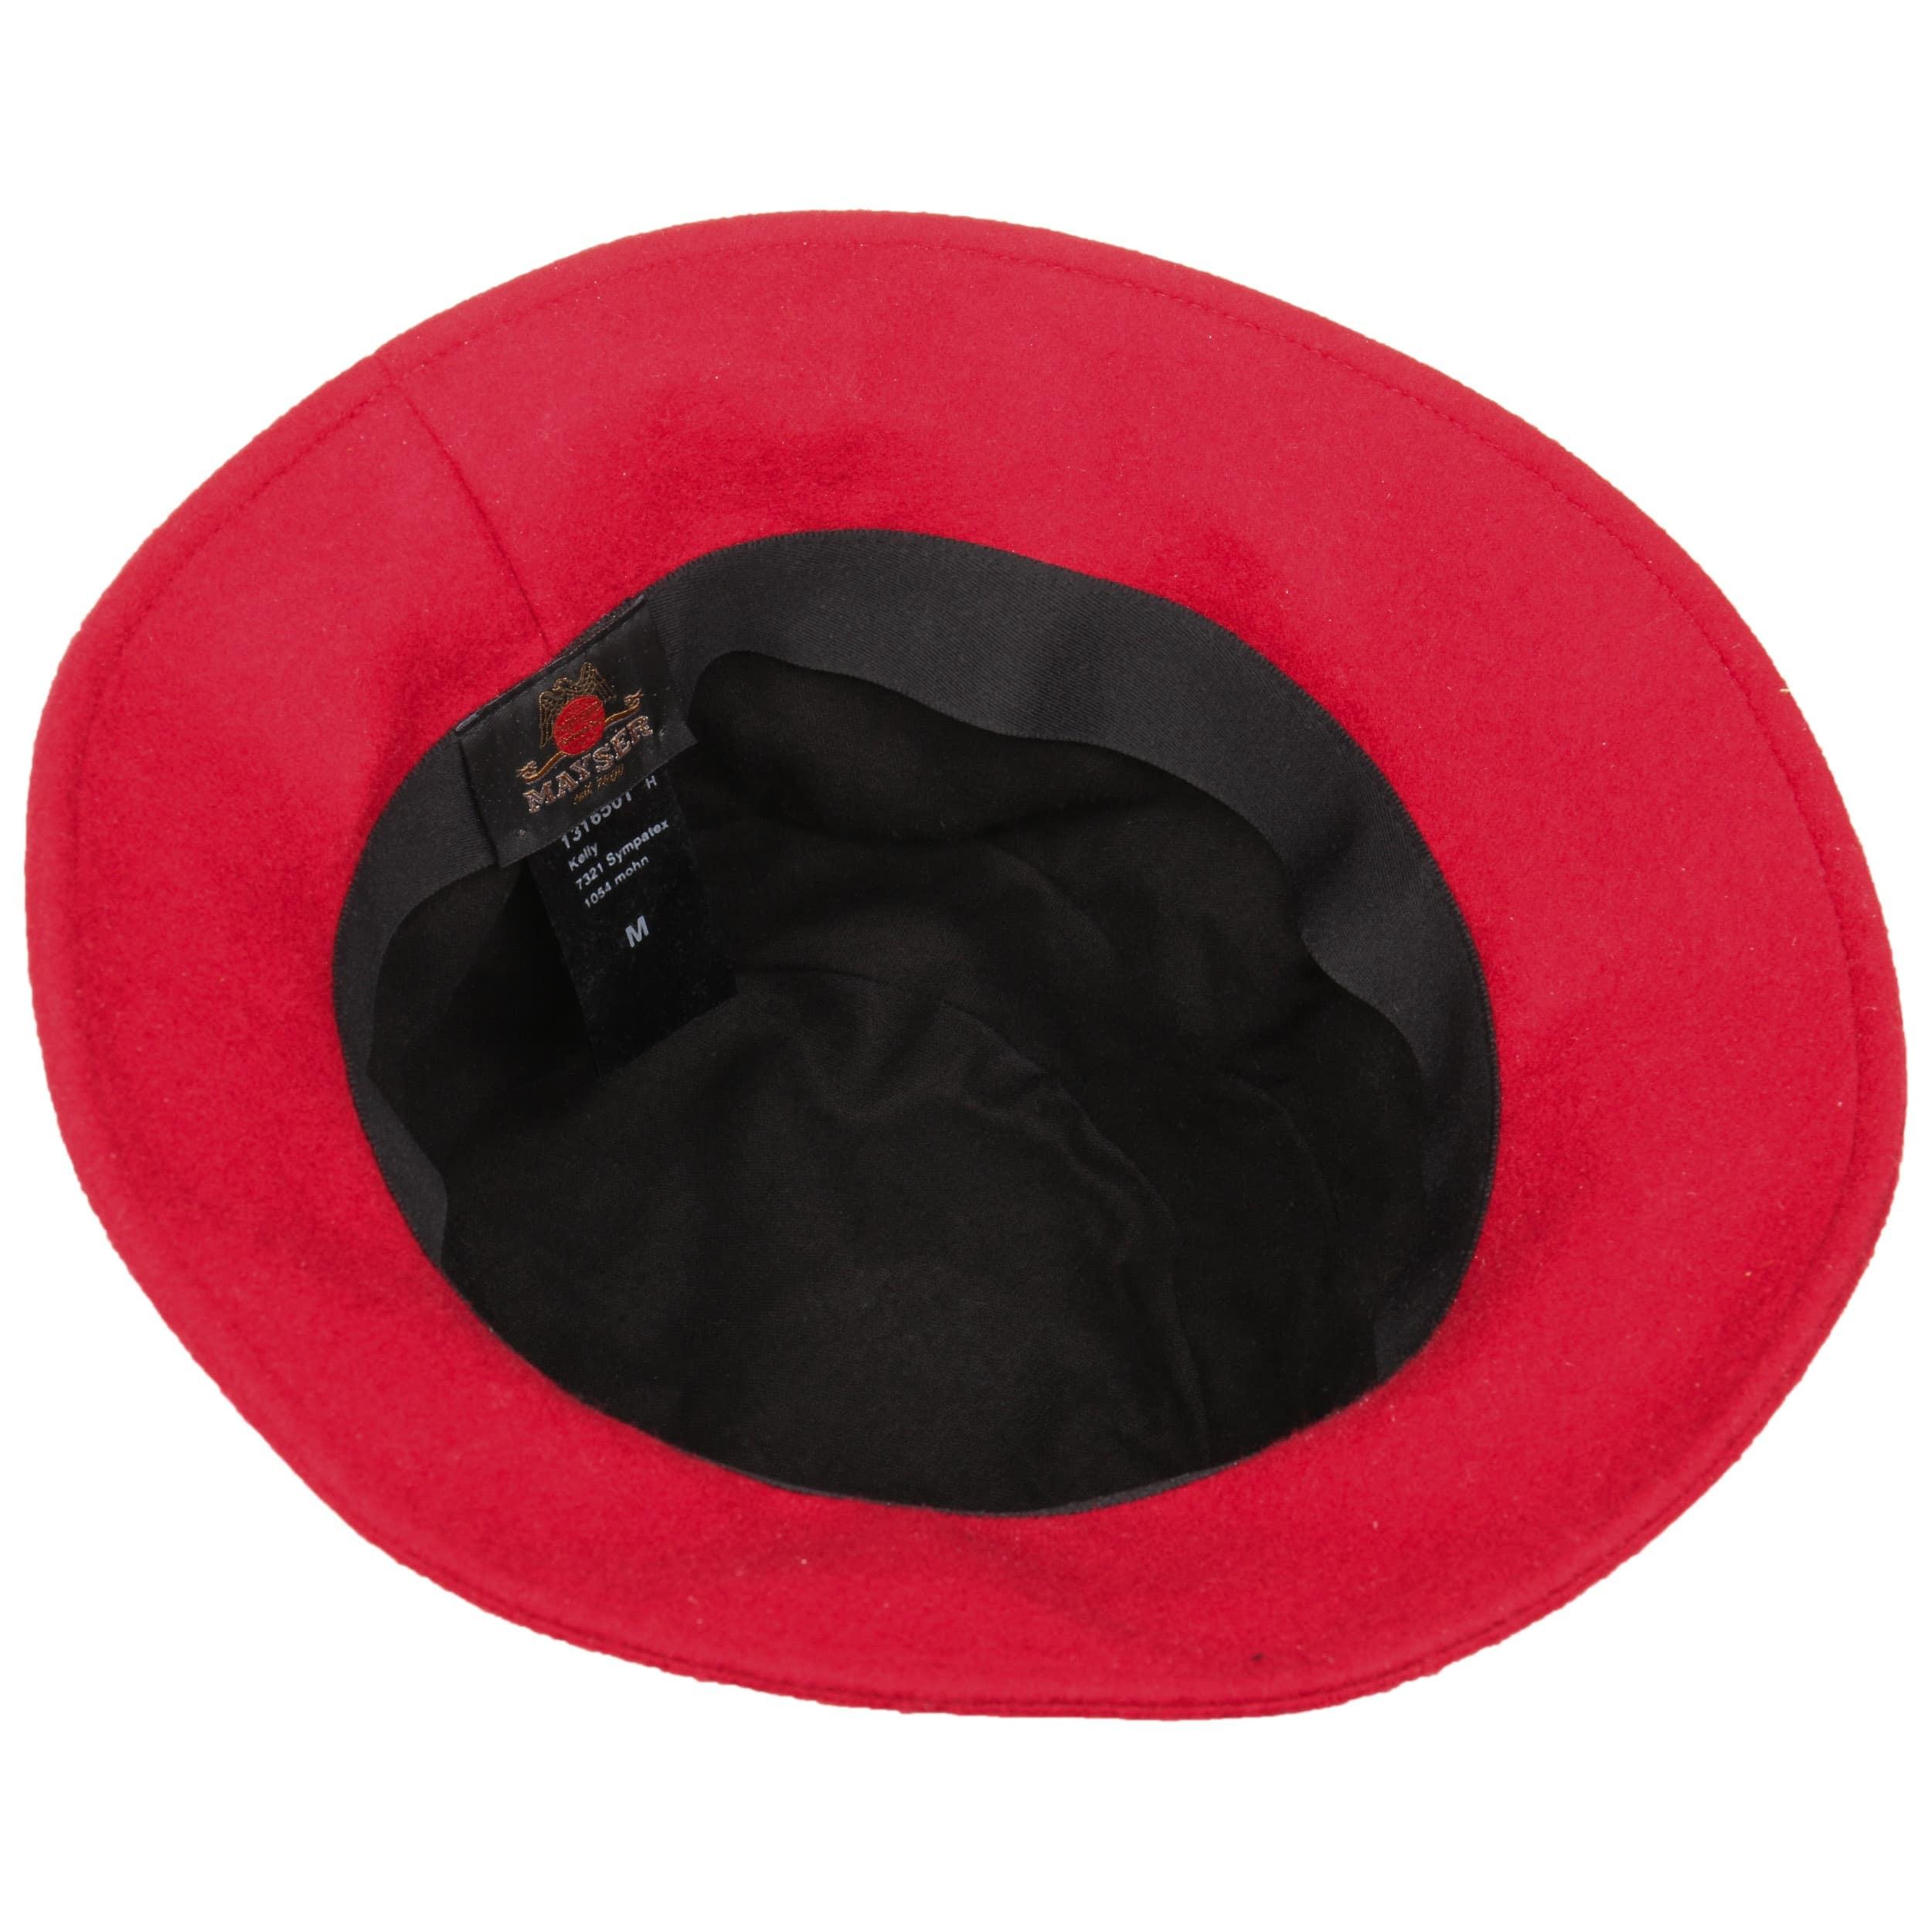 ... Cappello da Donna Kelly Sympatex by Mayser - rosso 2 ... 19d0c224ffb7